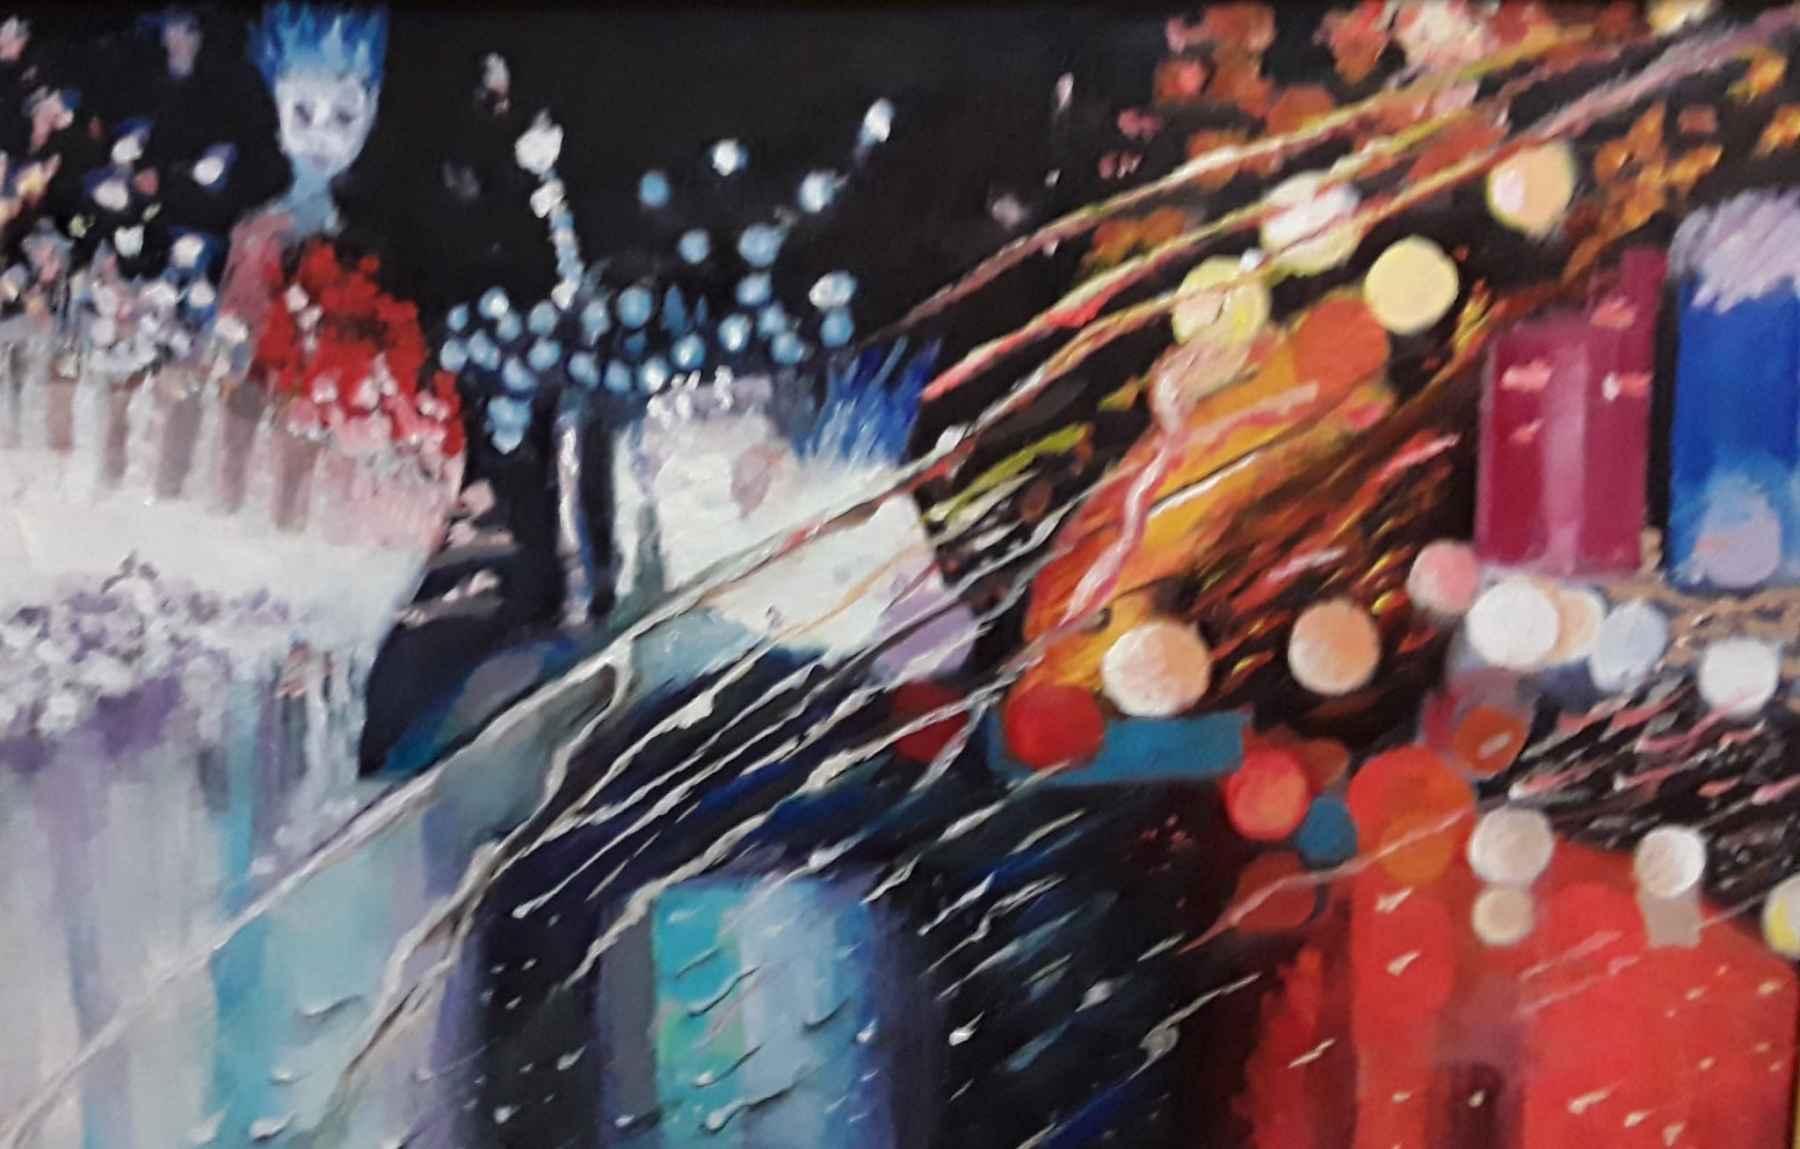 It's my life | Personal art exhibition OLIVIA AFIONIS